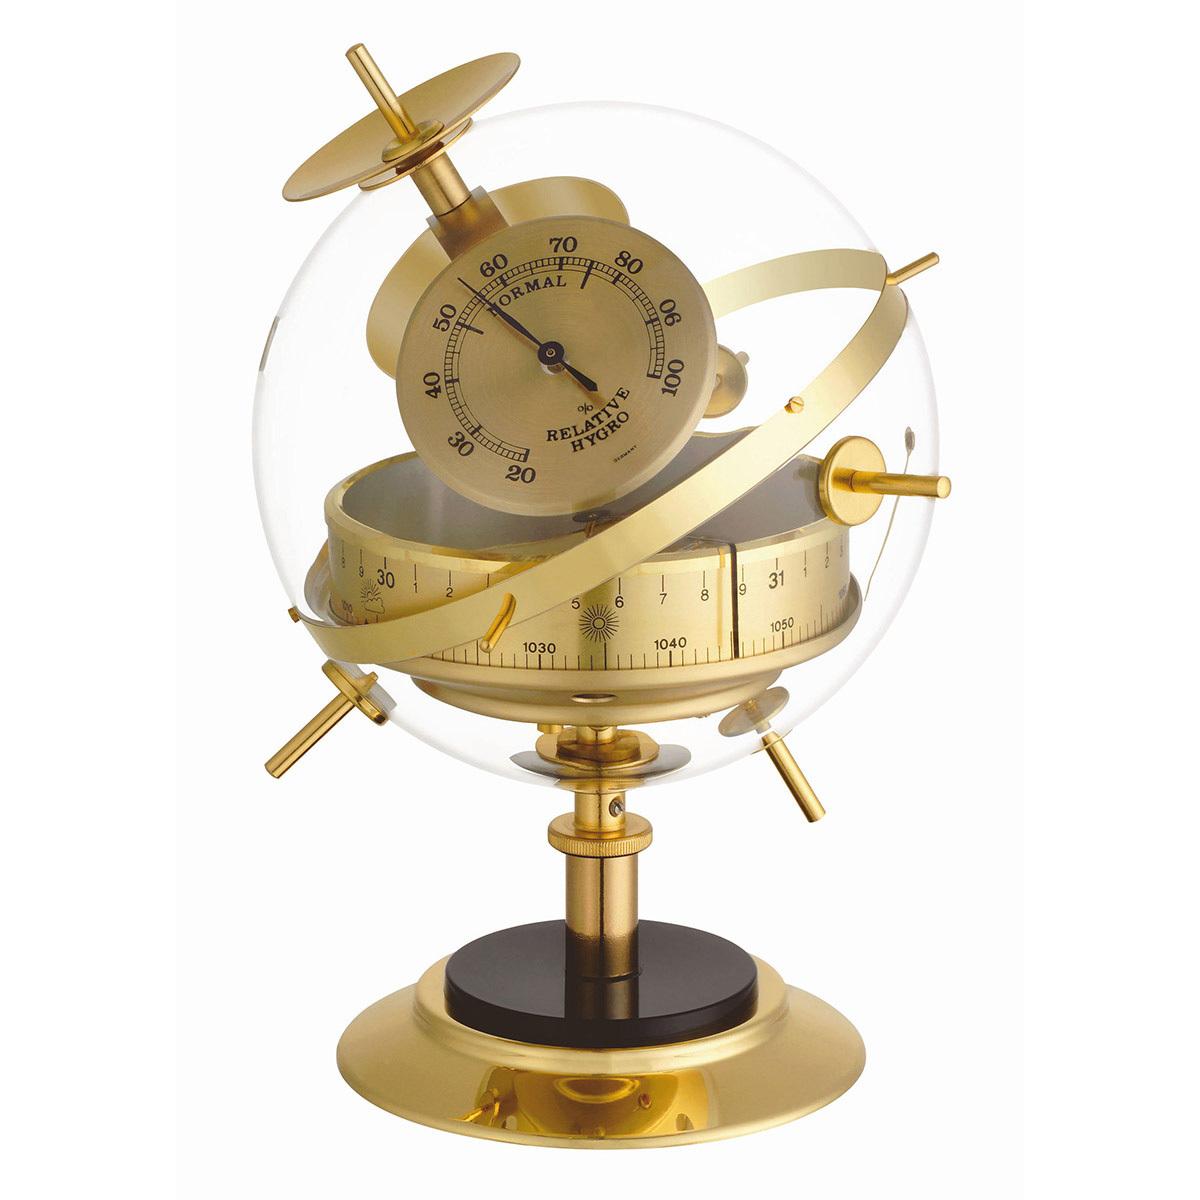 20-2047-52-b-analoge-wetterstation-sputnik-1200x1200px.jpg